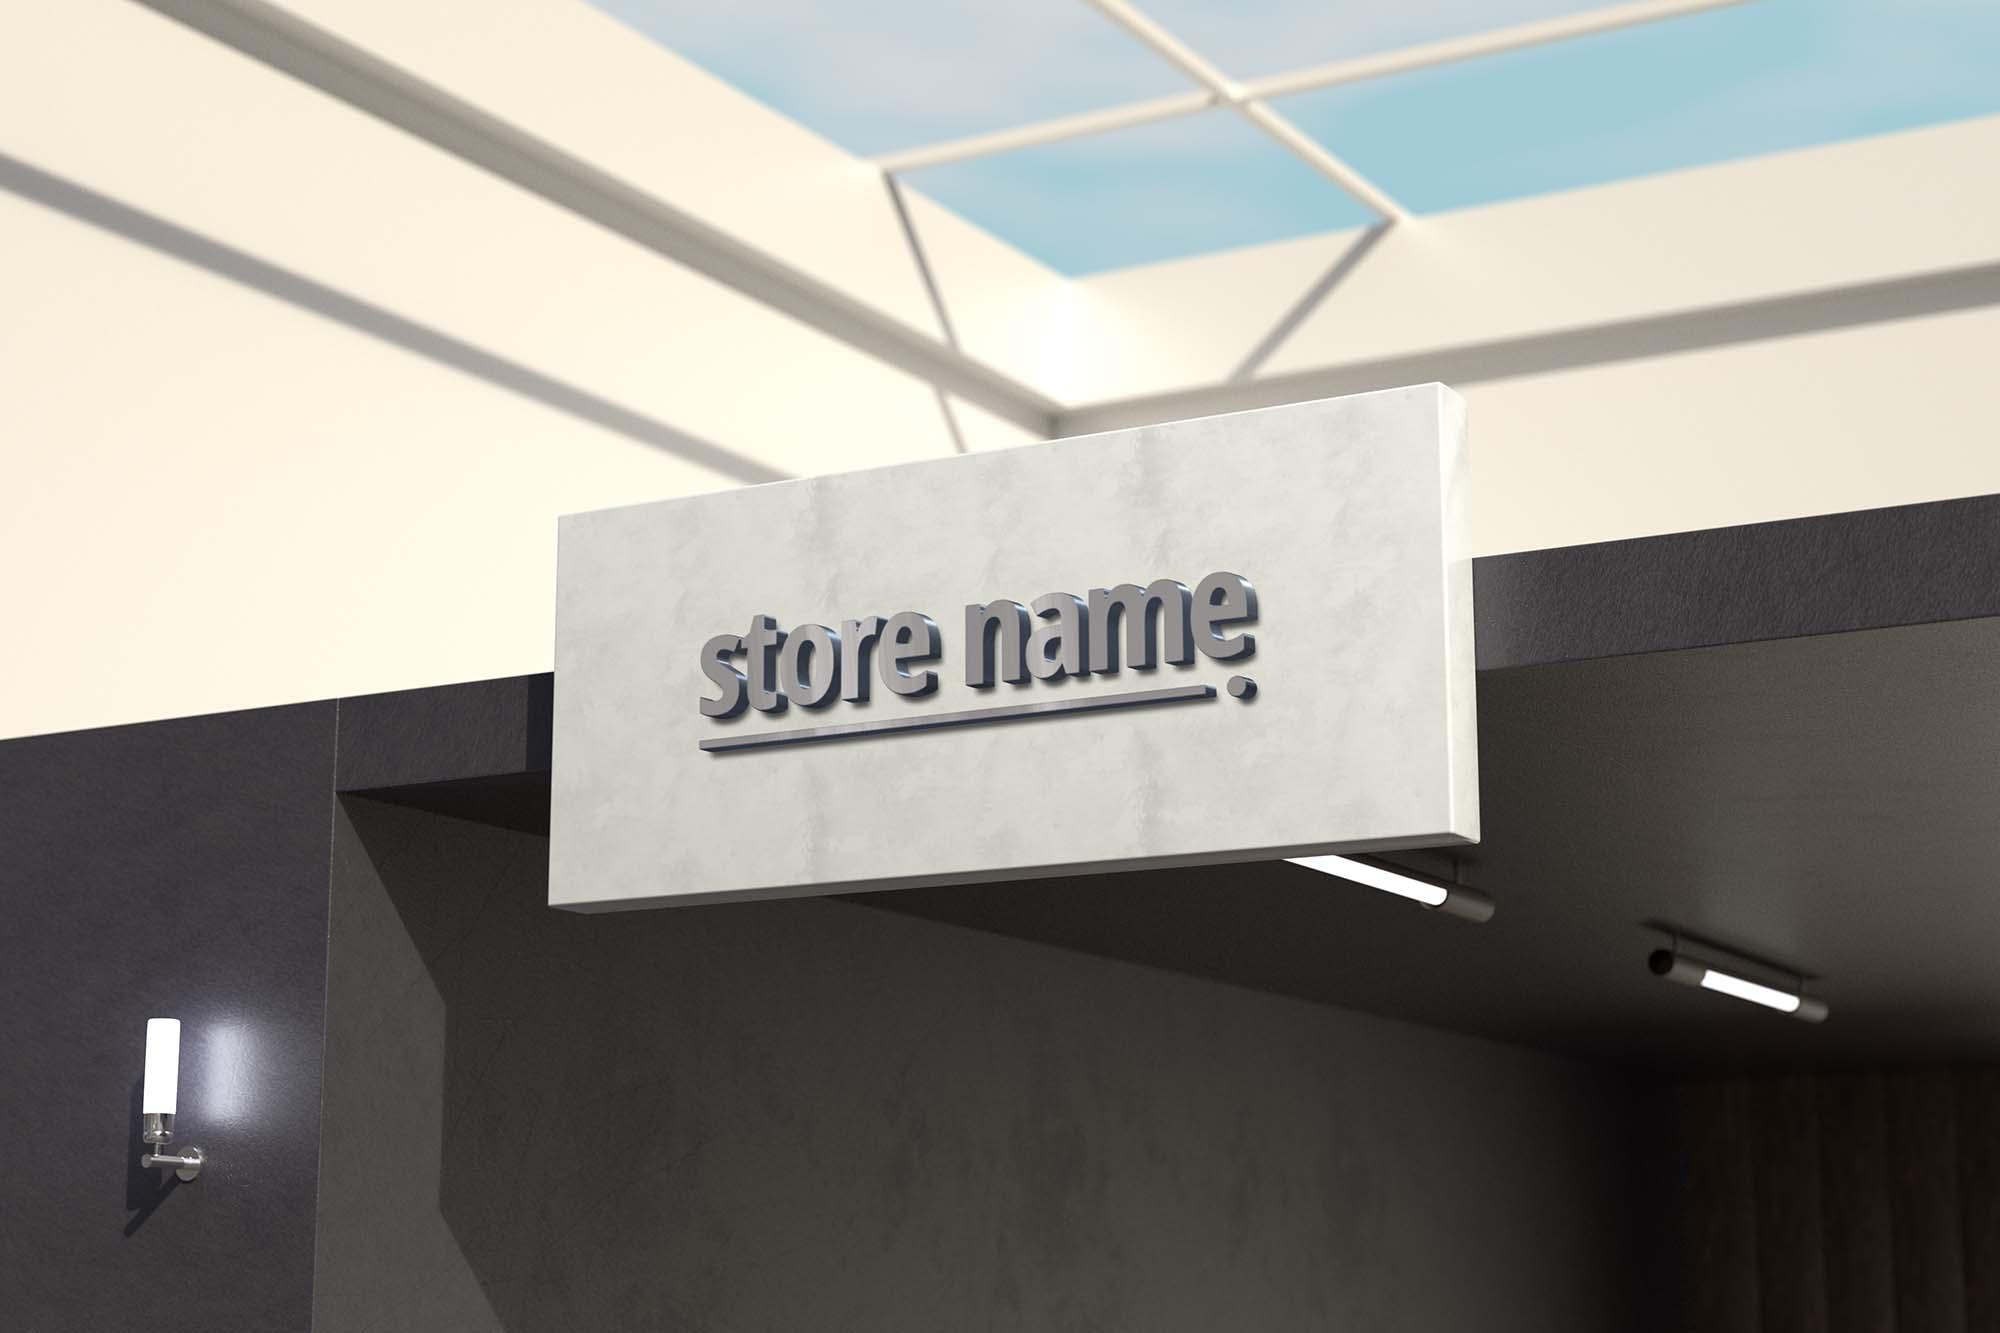 3D Store Sign Name Mockup